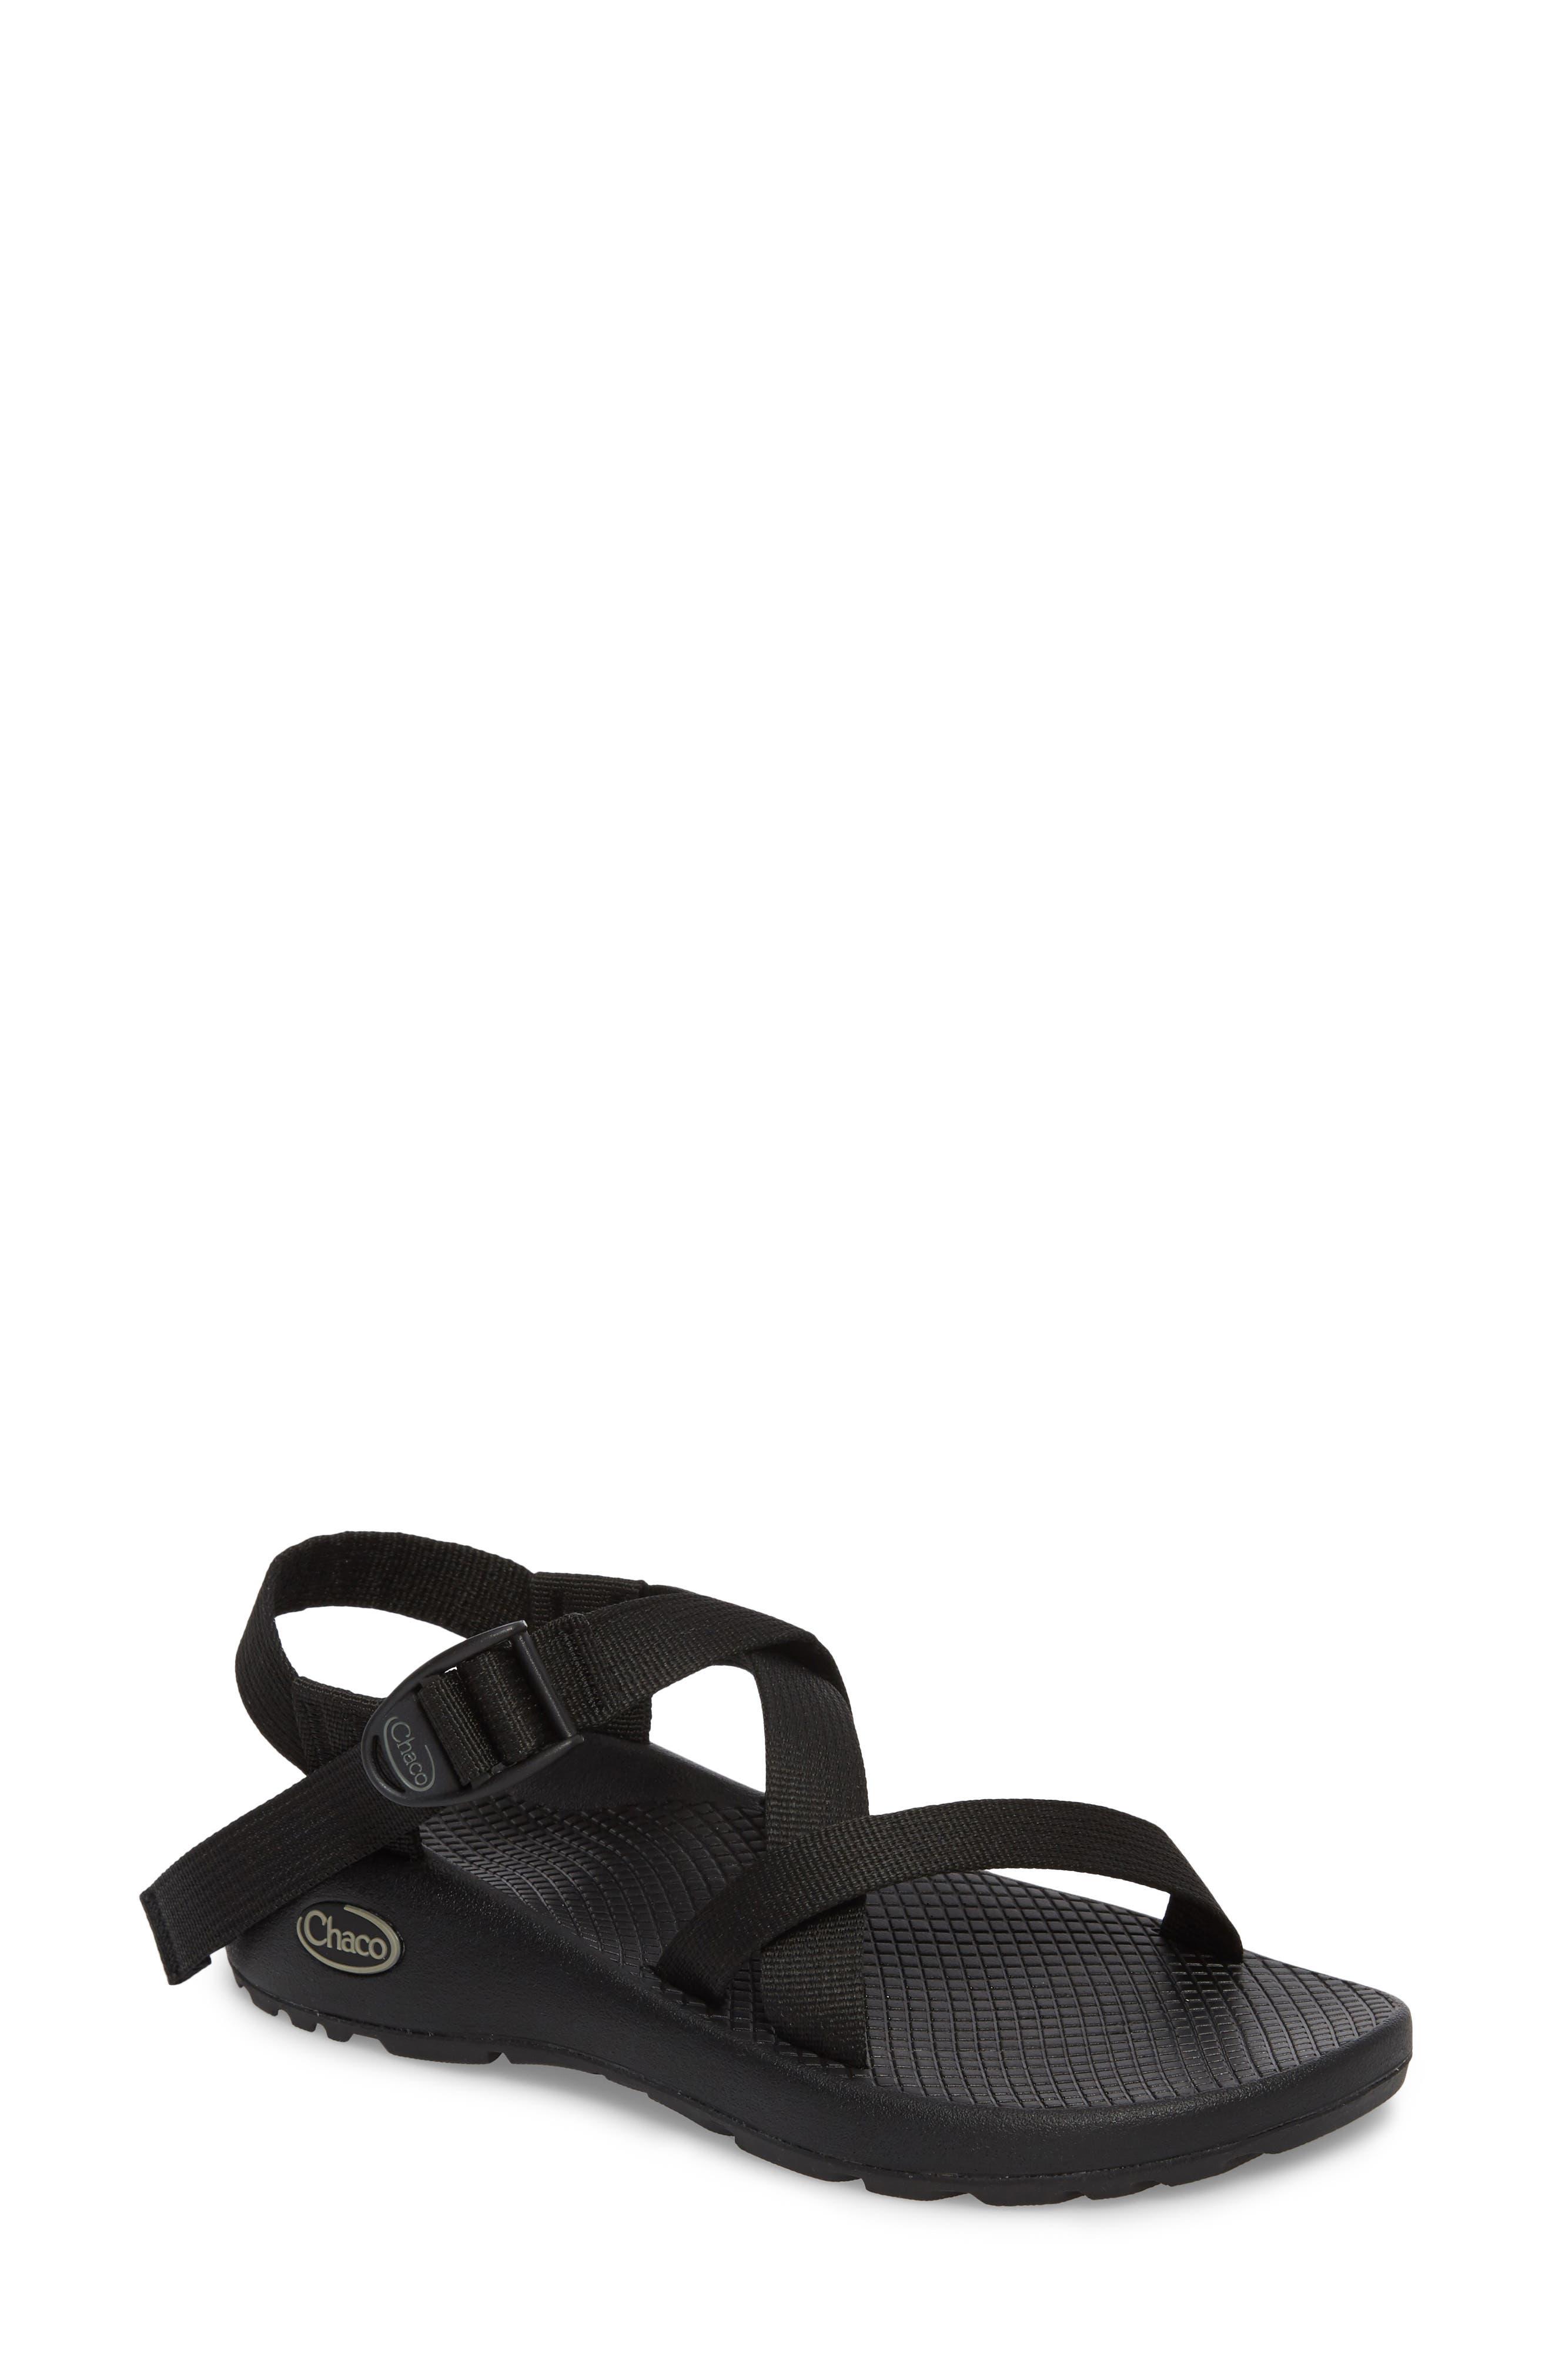 Alternate Image 1 Selected - Chaco Z/1 Classic Sport Sandal (Women)